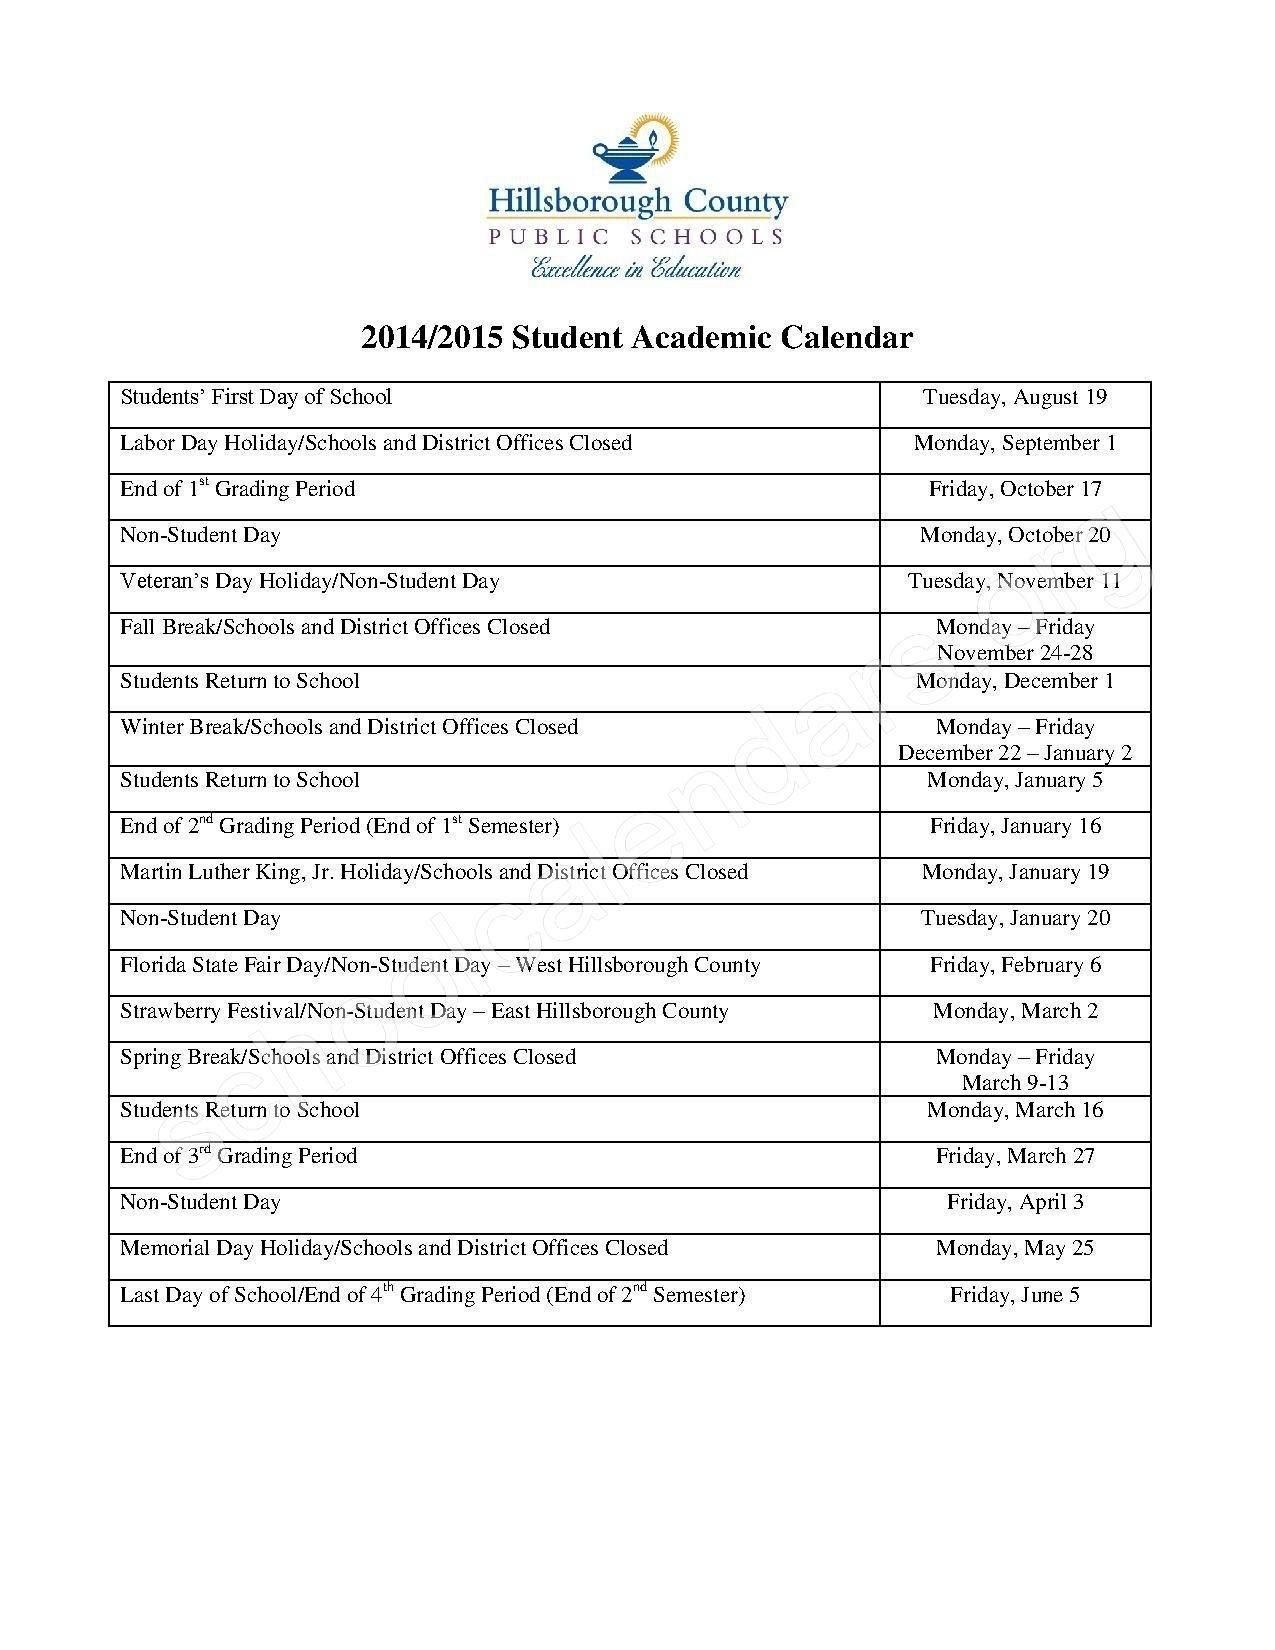 Hillsborough County School Calendar | Isacl